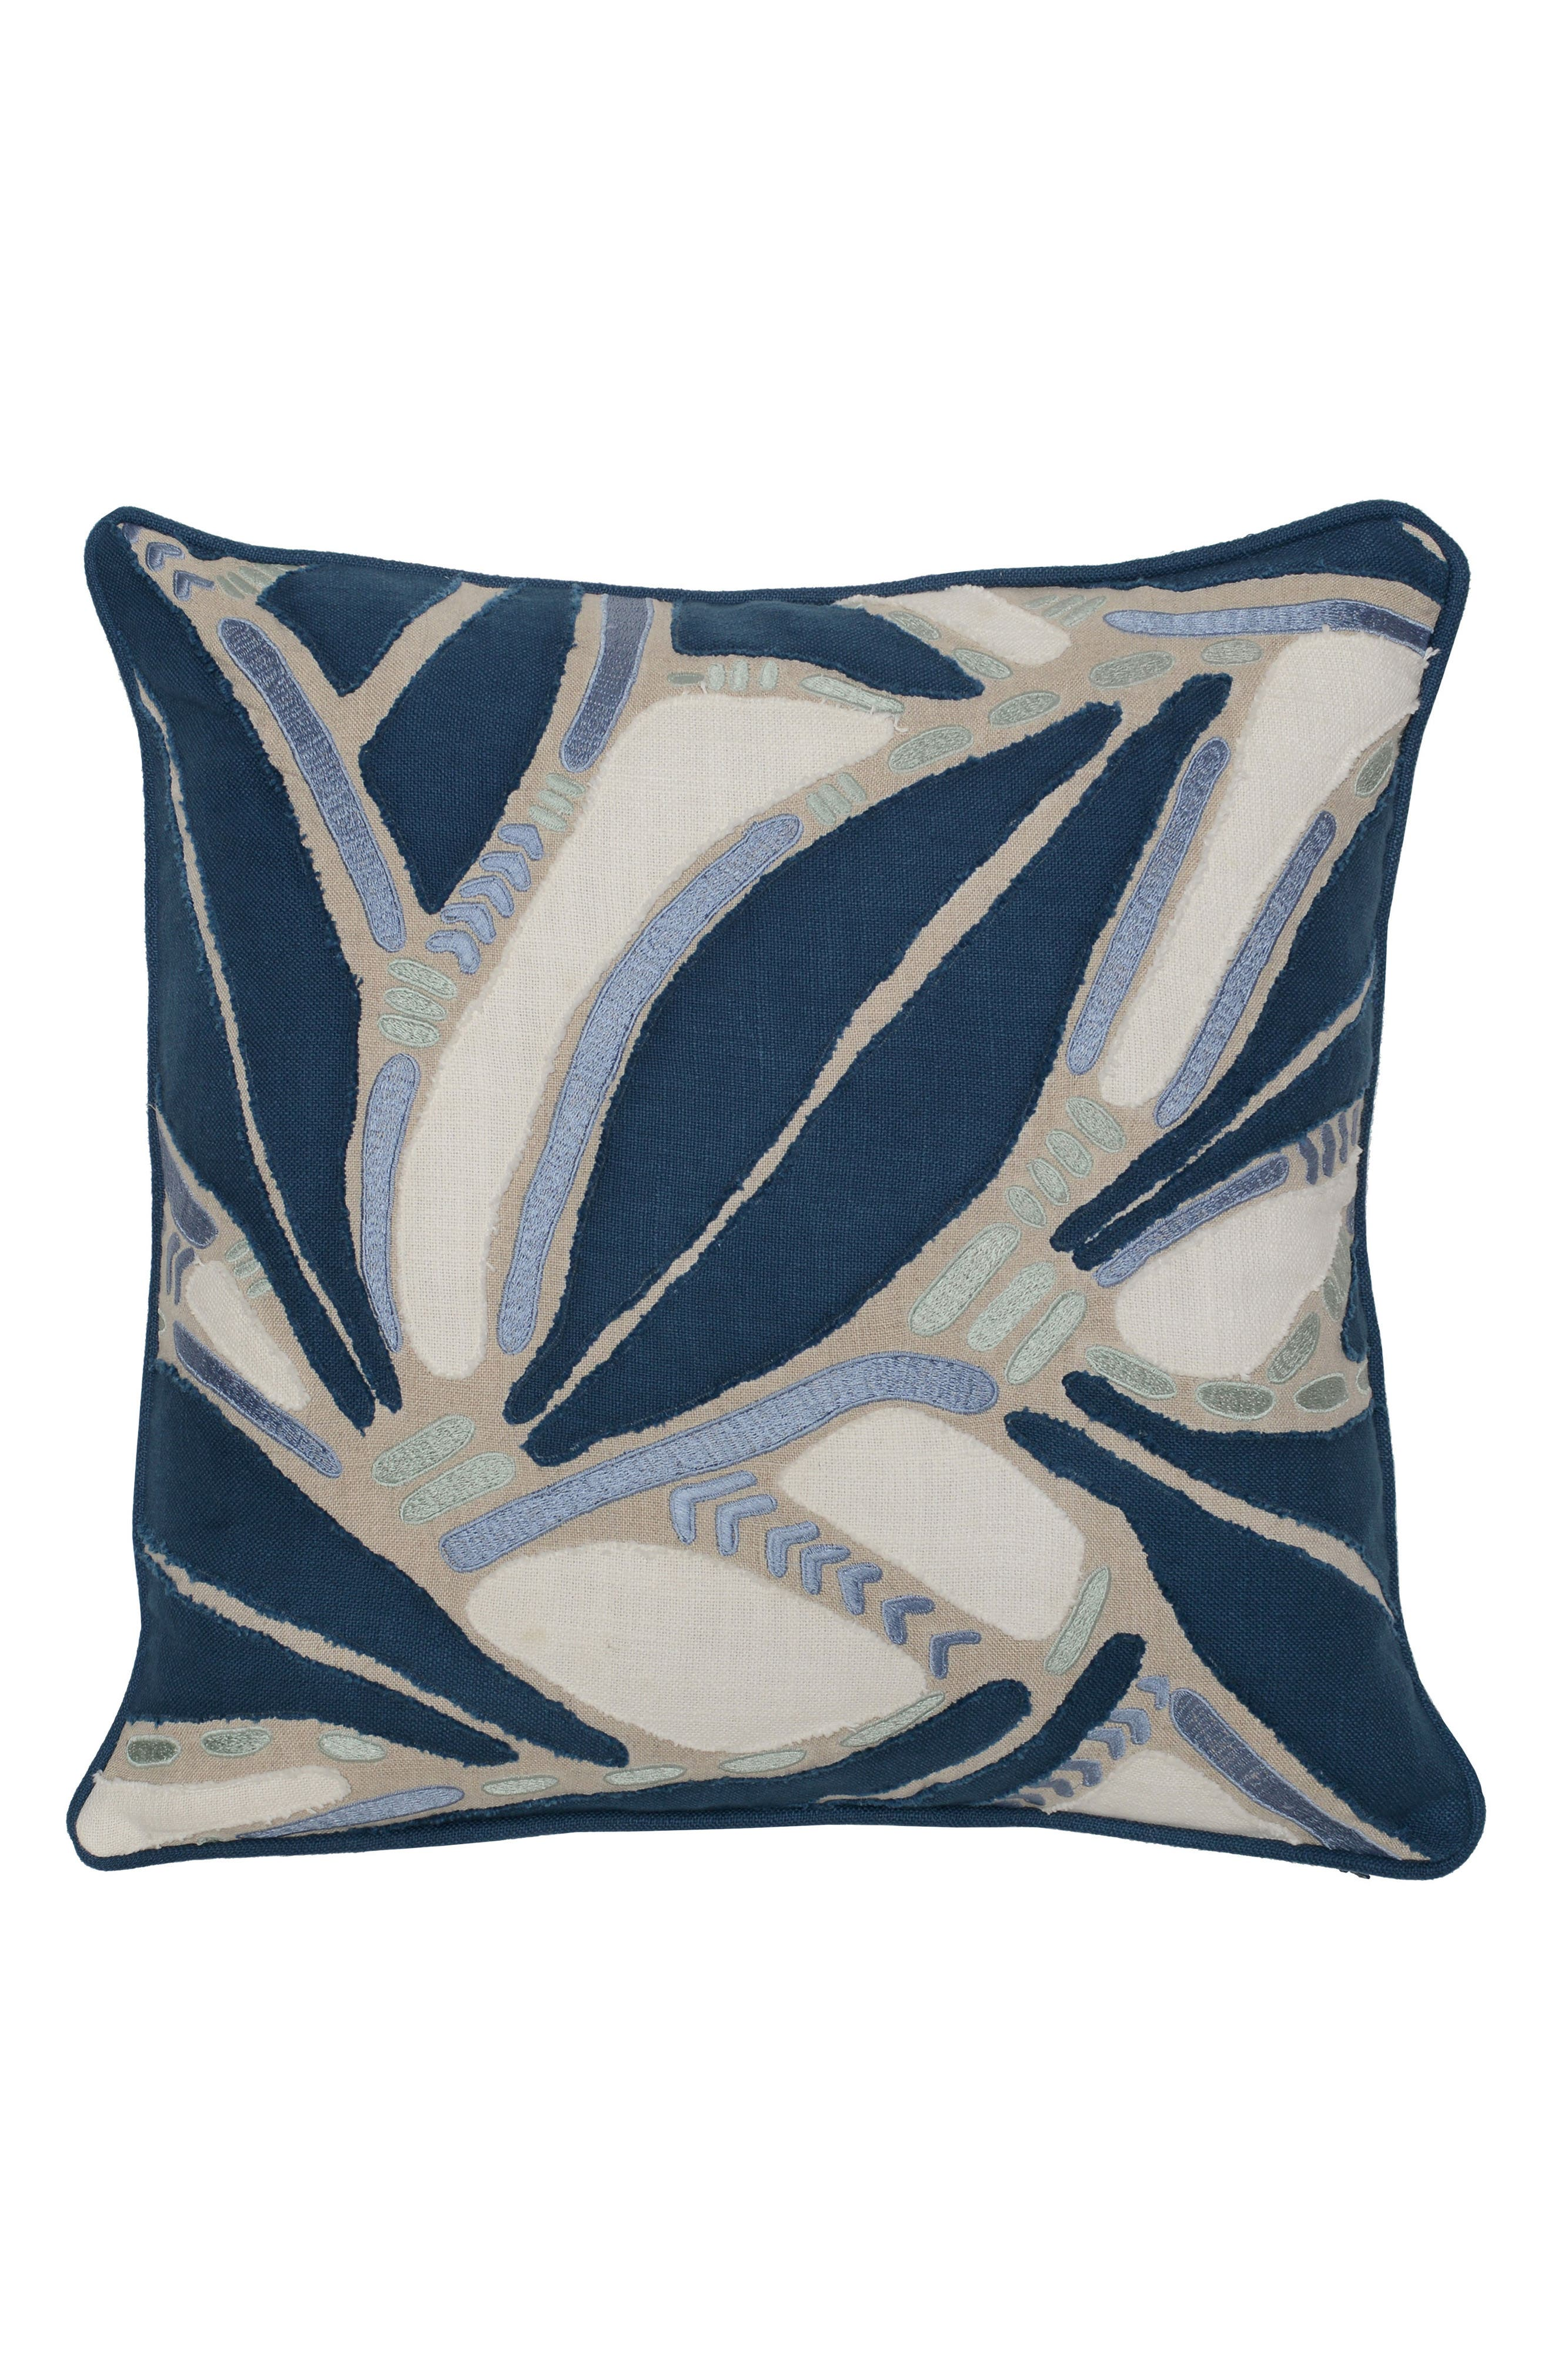 Lilo Accent Pillow,                         Main,                         color, NAVY/ BLUE